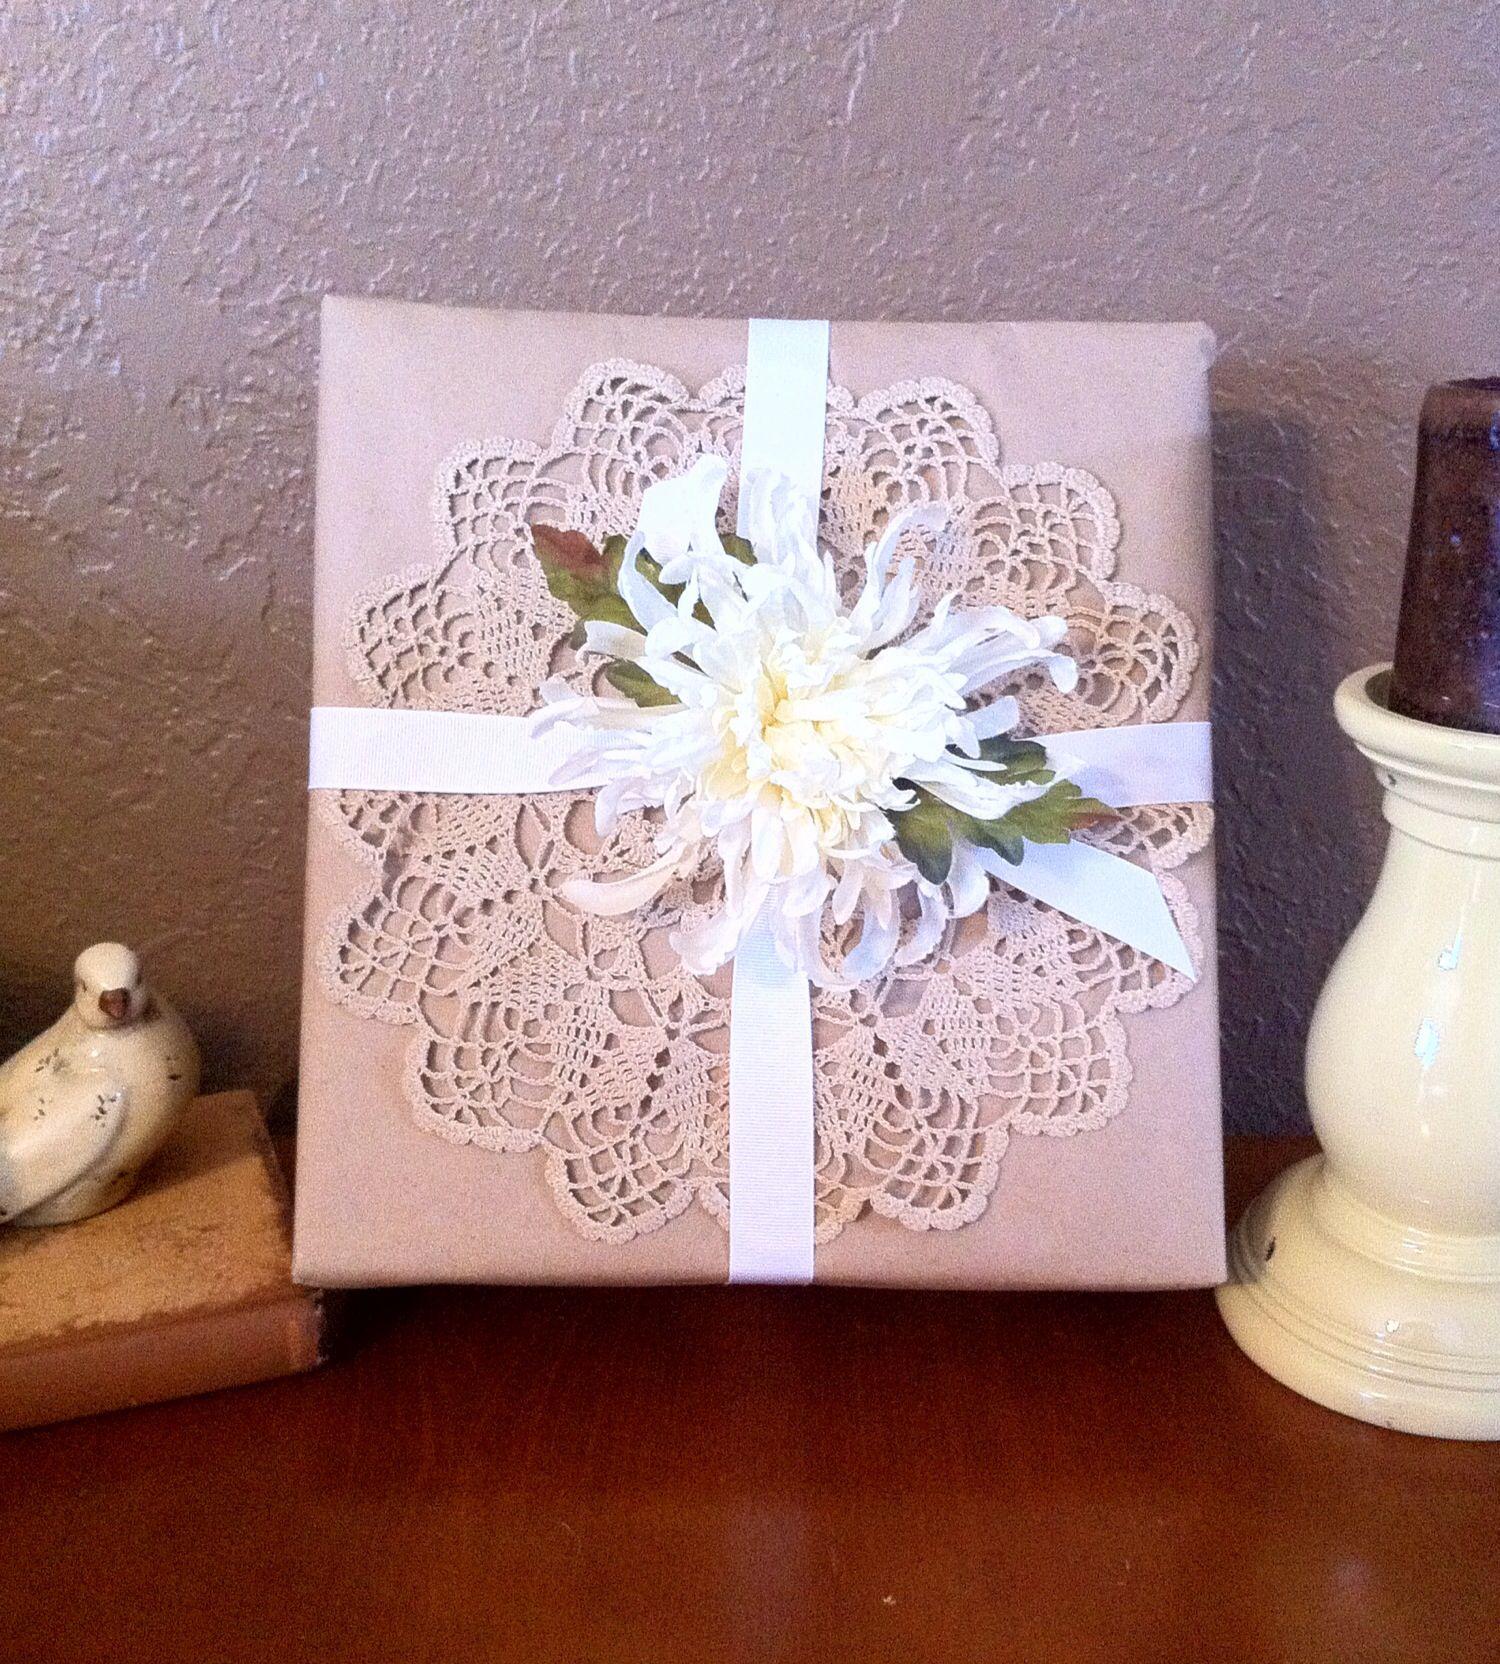 Bridal Gift Ideas: Bridal Shower Gift Wrap. Craft Paper, Vintage Doily, White